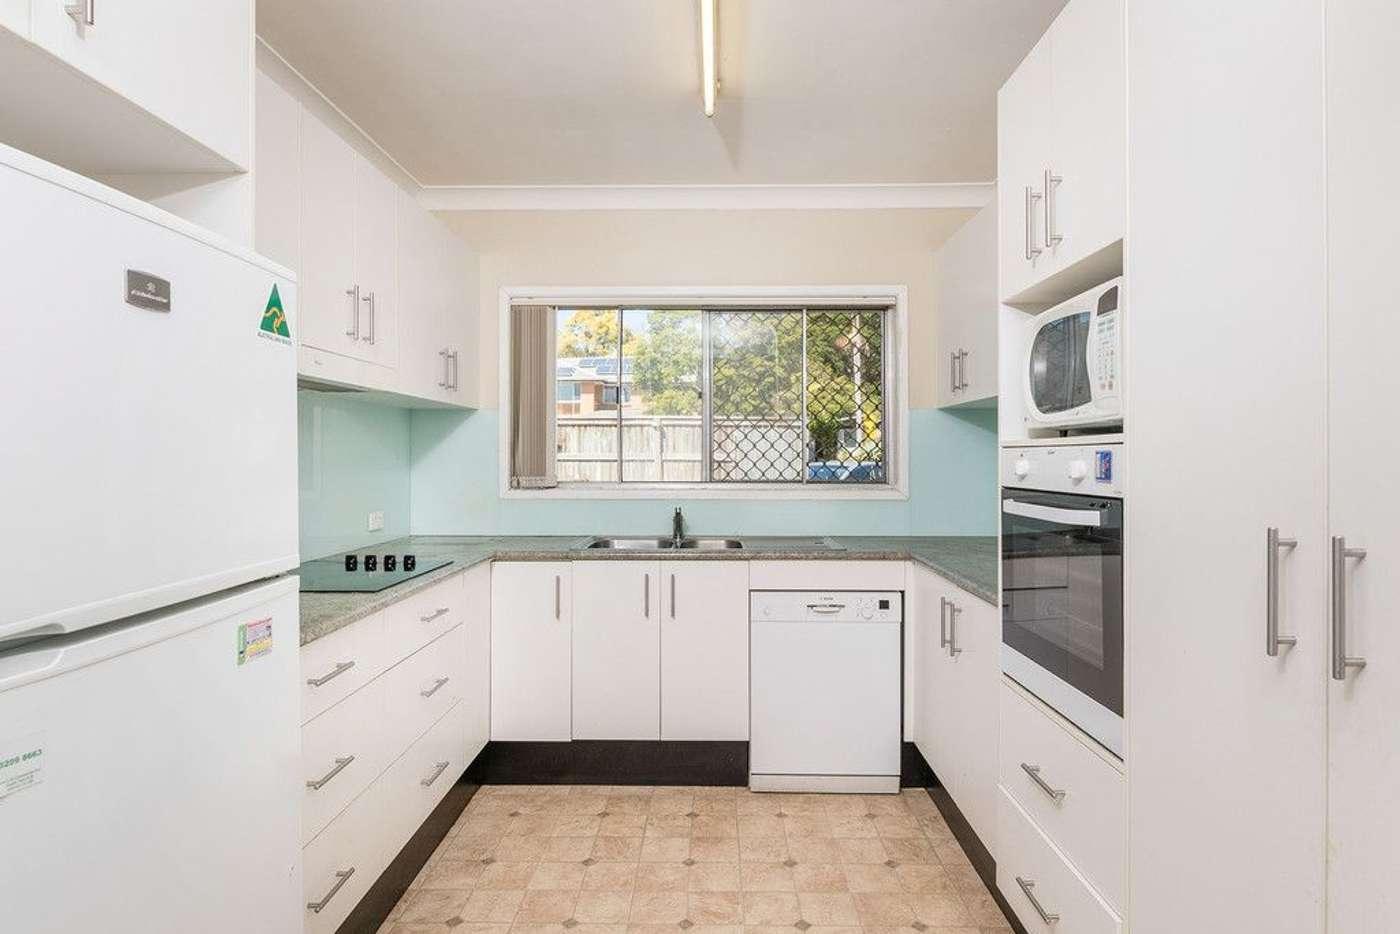 Sixth view of Homely house listing, 115 Gaynesford Street, Mount Gravatt QLD 4122